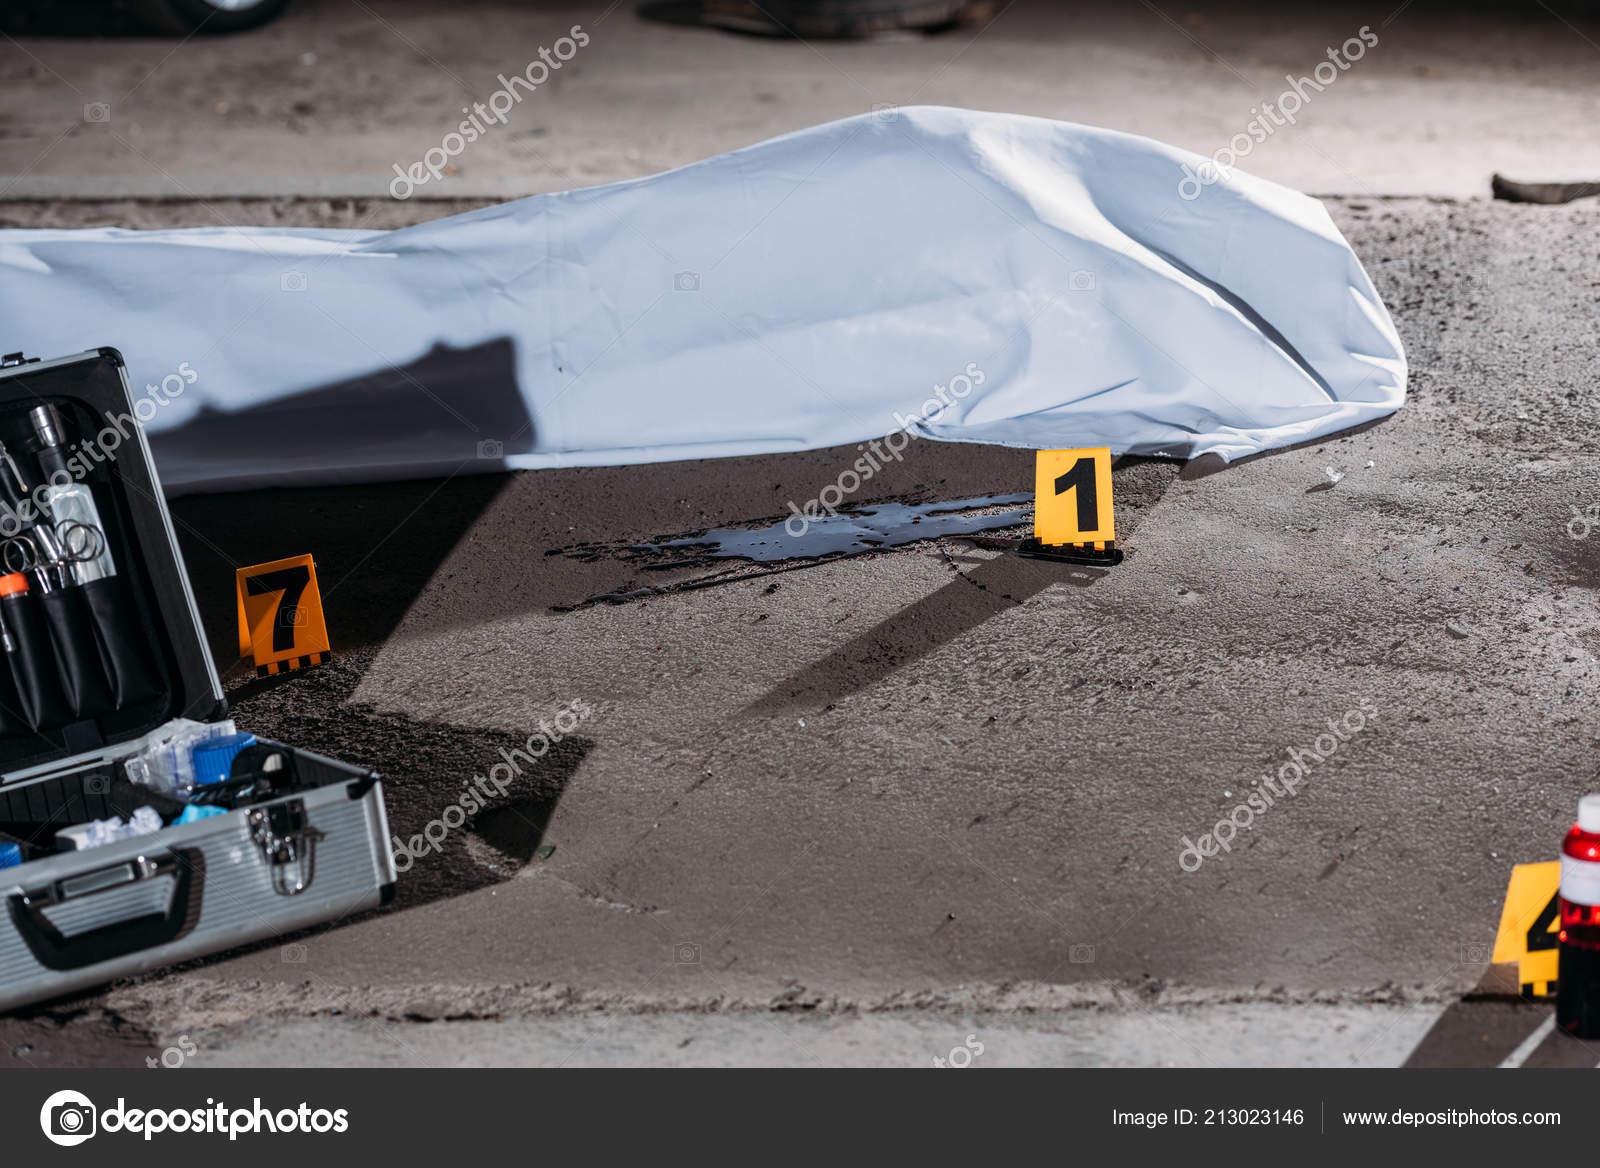 Close View Corpse Body Bag Case Investigation Tools Crime